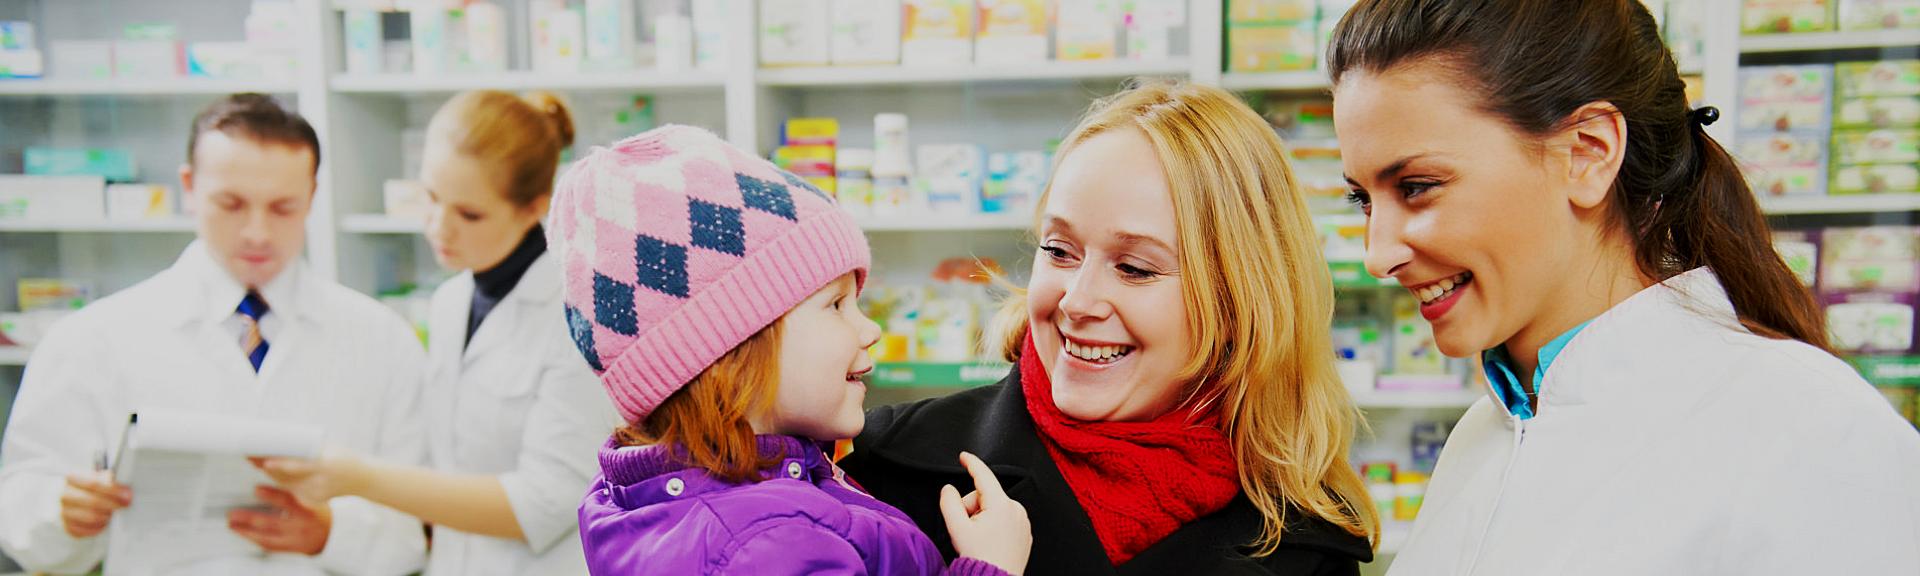 pharmacists with customer